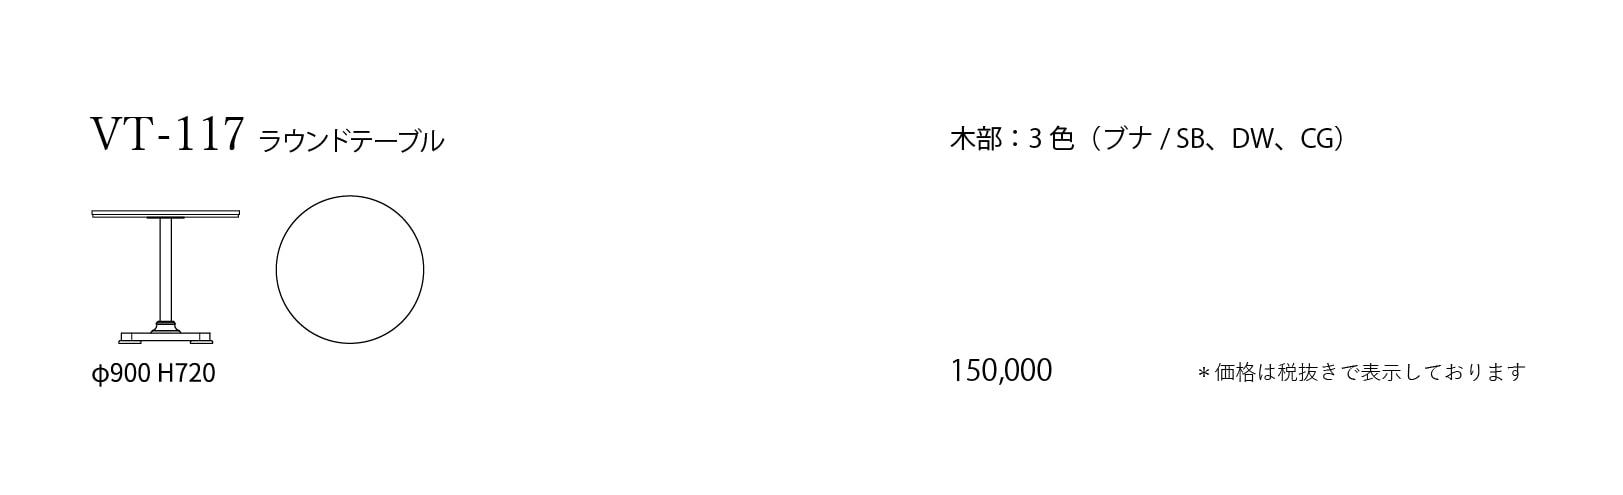 VT-117 Price List